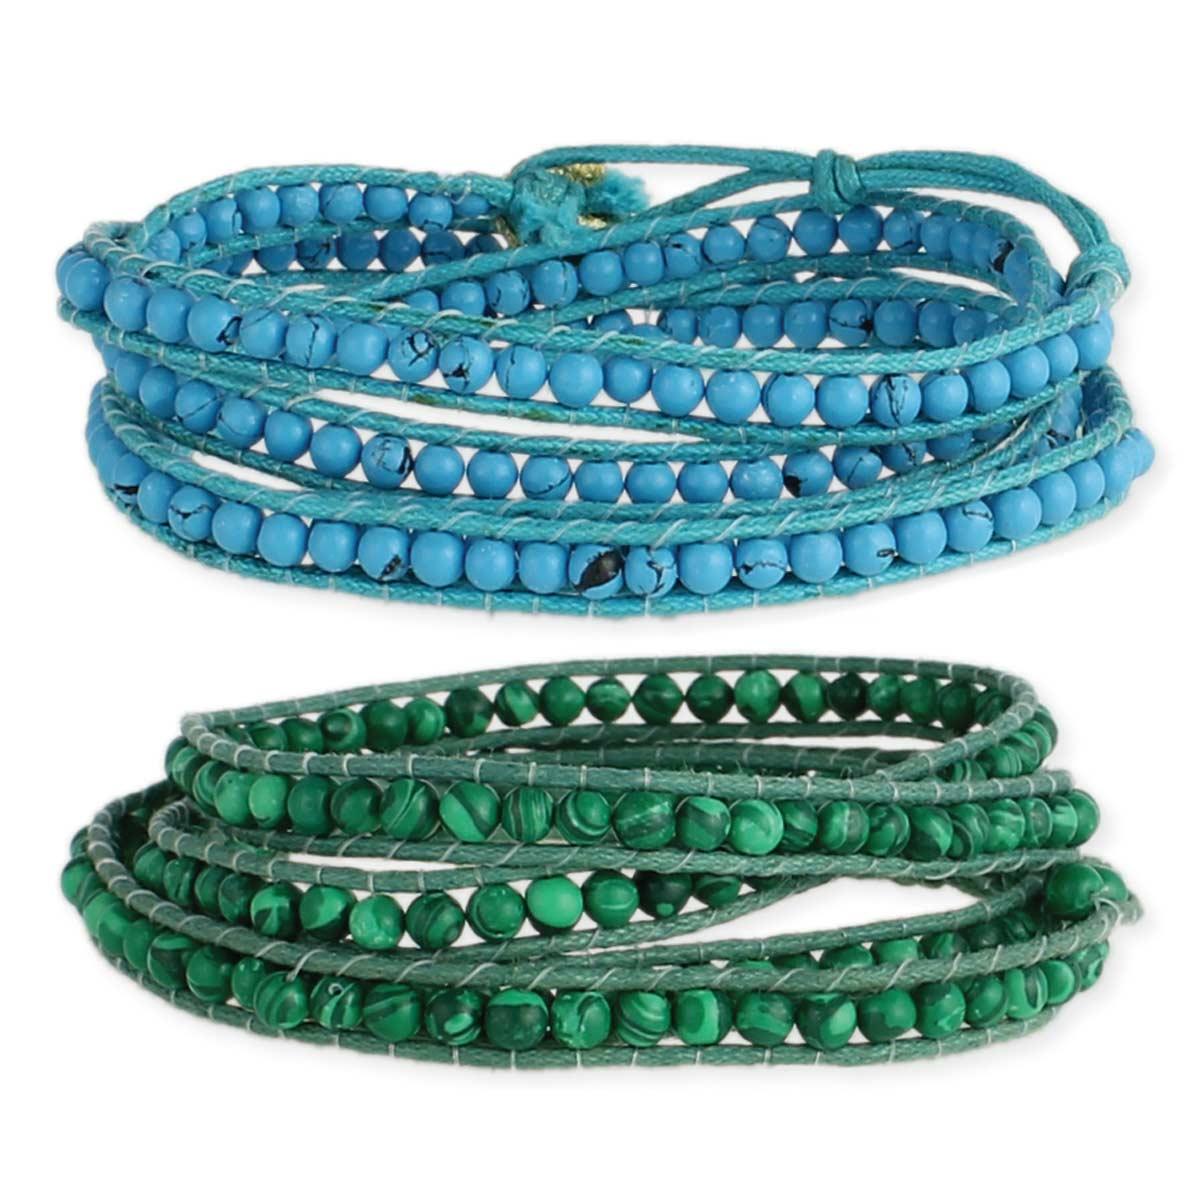 Turqoise & Green Stone Bead Wrap Bracelets